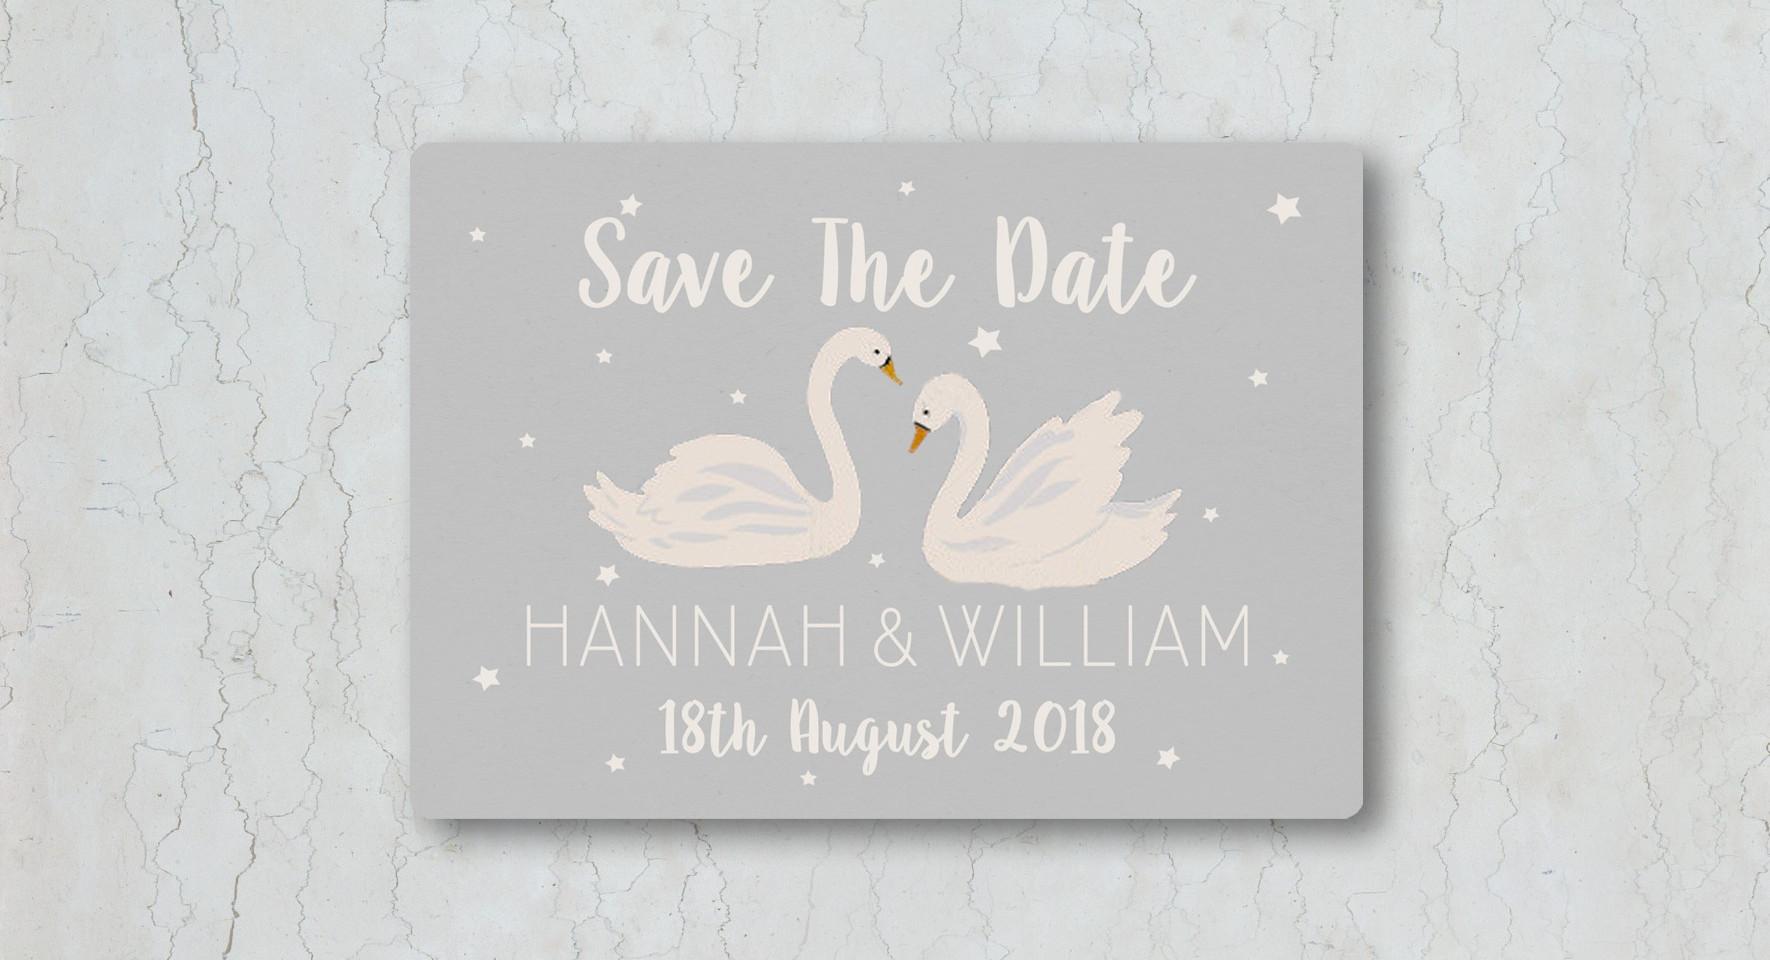 Swan Save the Date Wedding Invitation